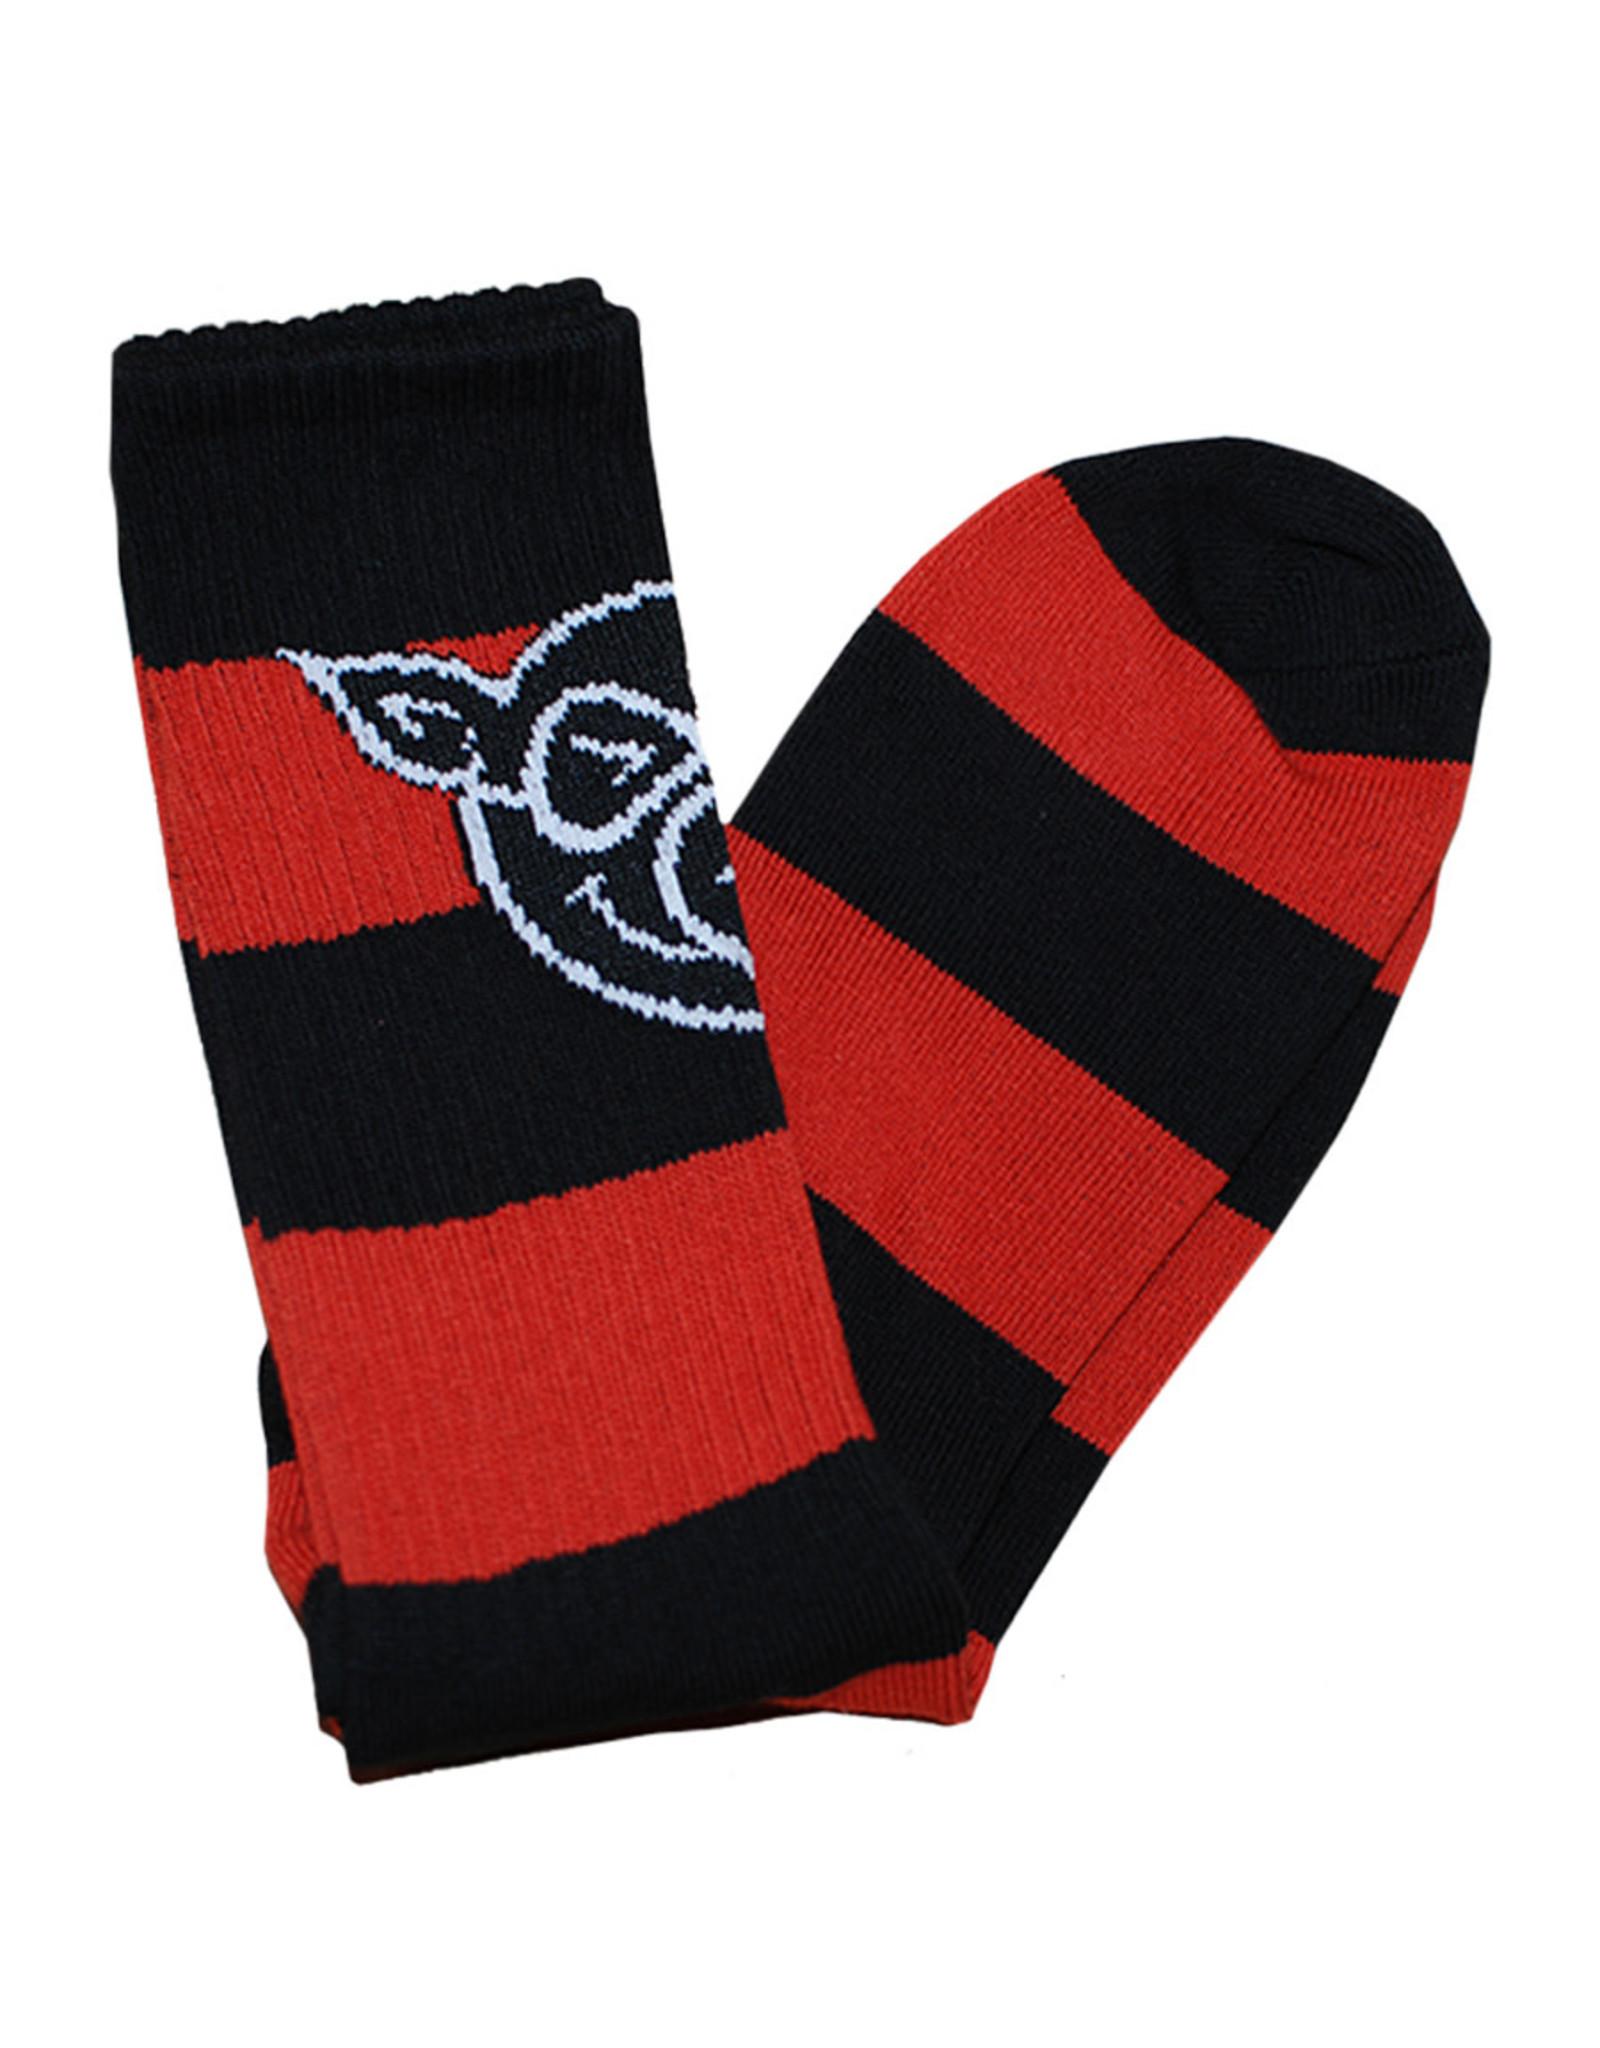 Pig Pig Socks Pig Head Striped Tall (Black/Red)